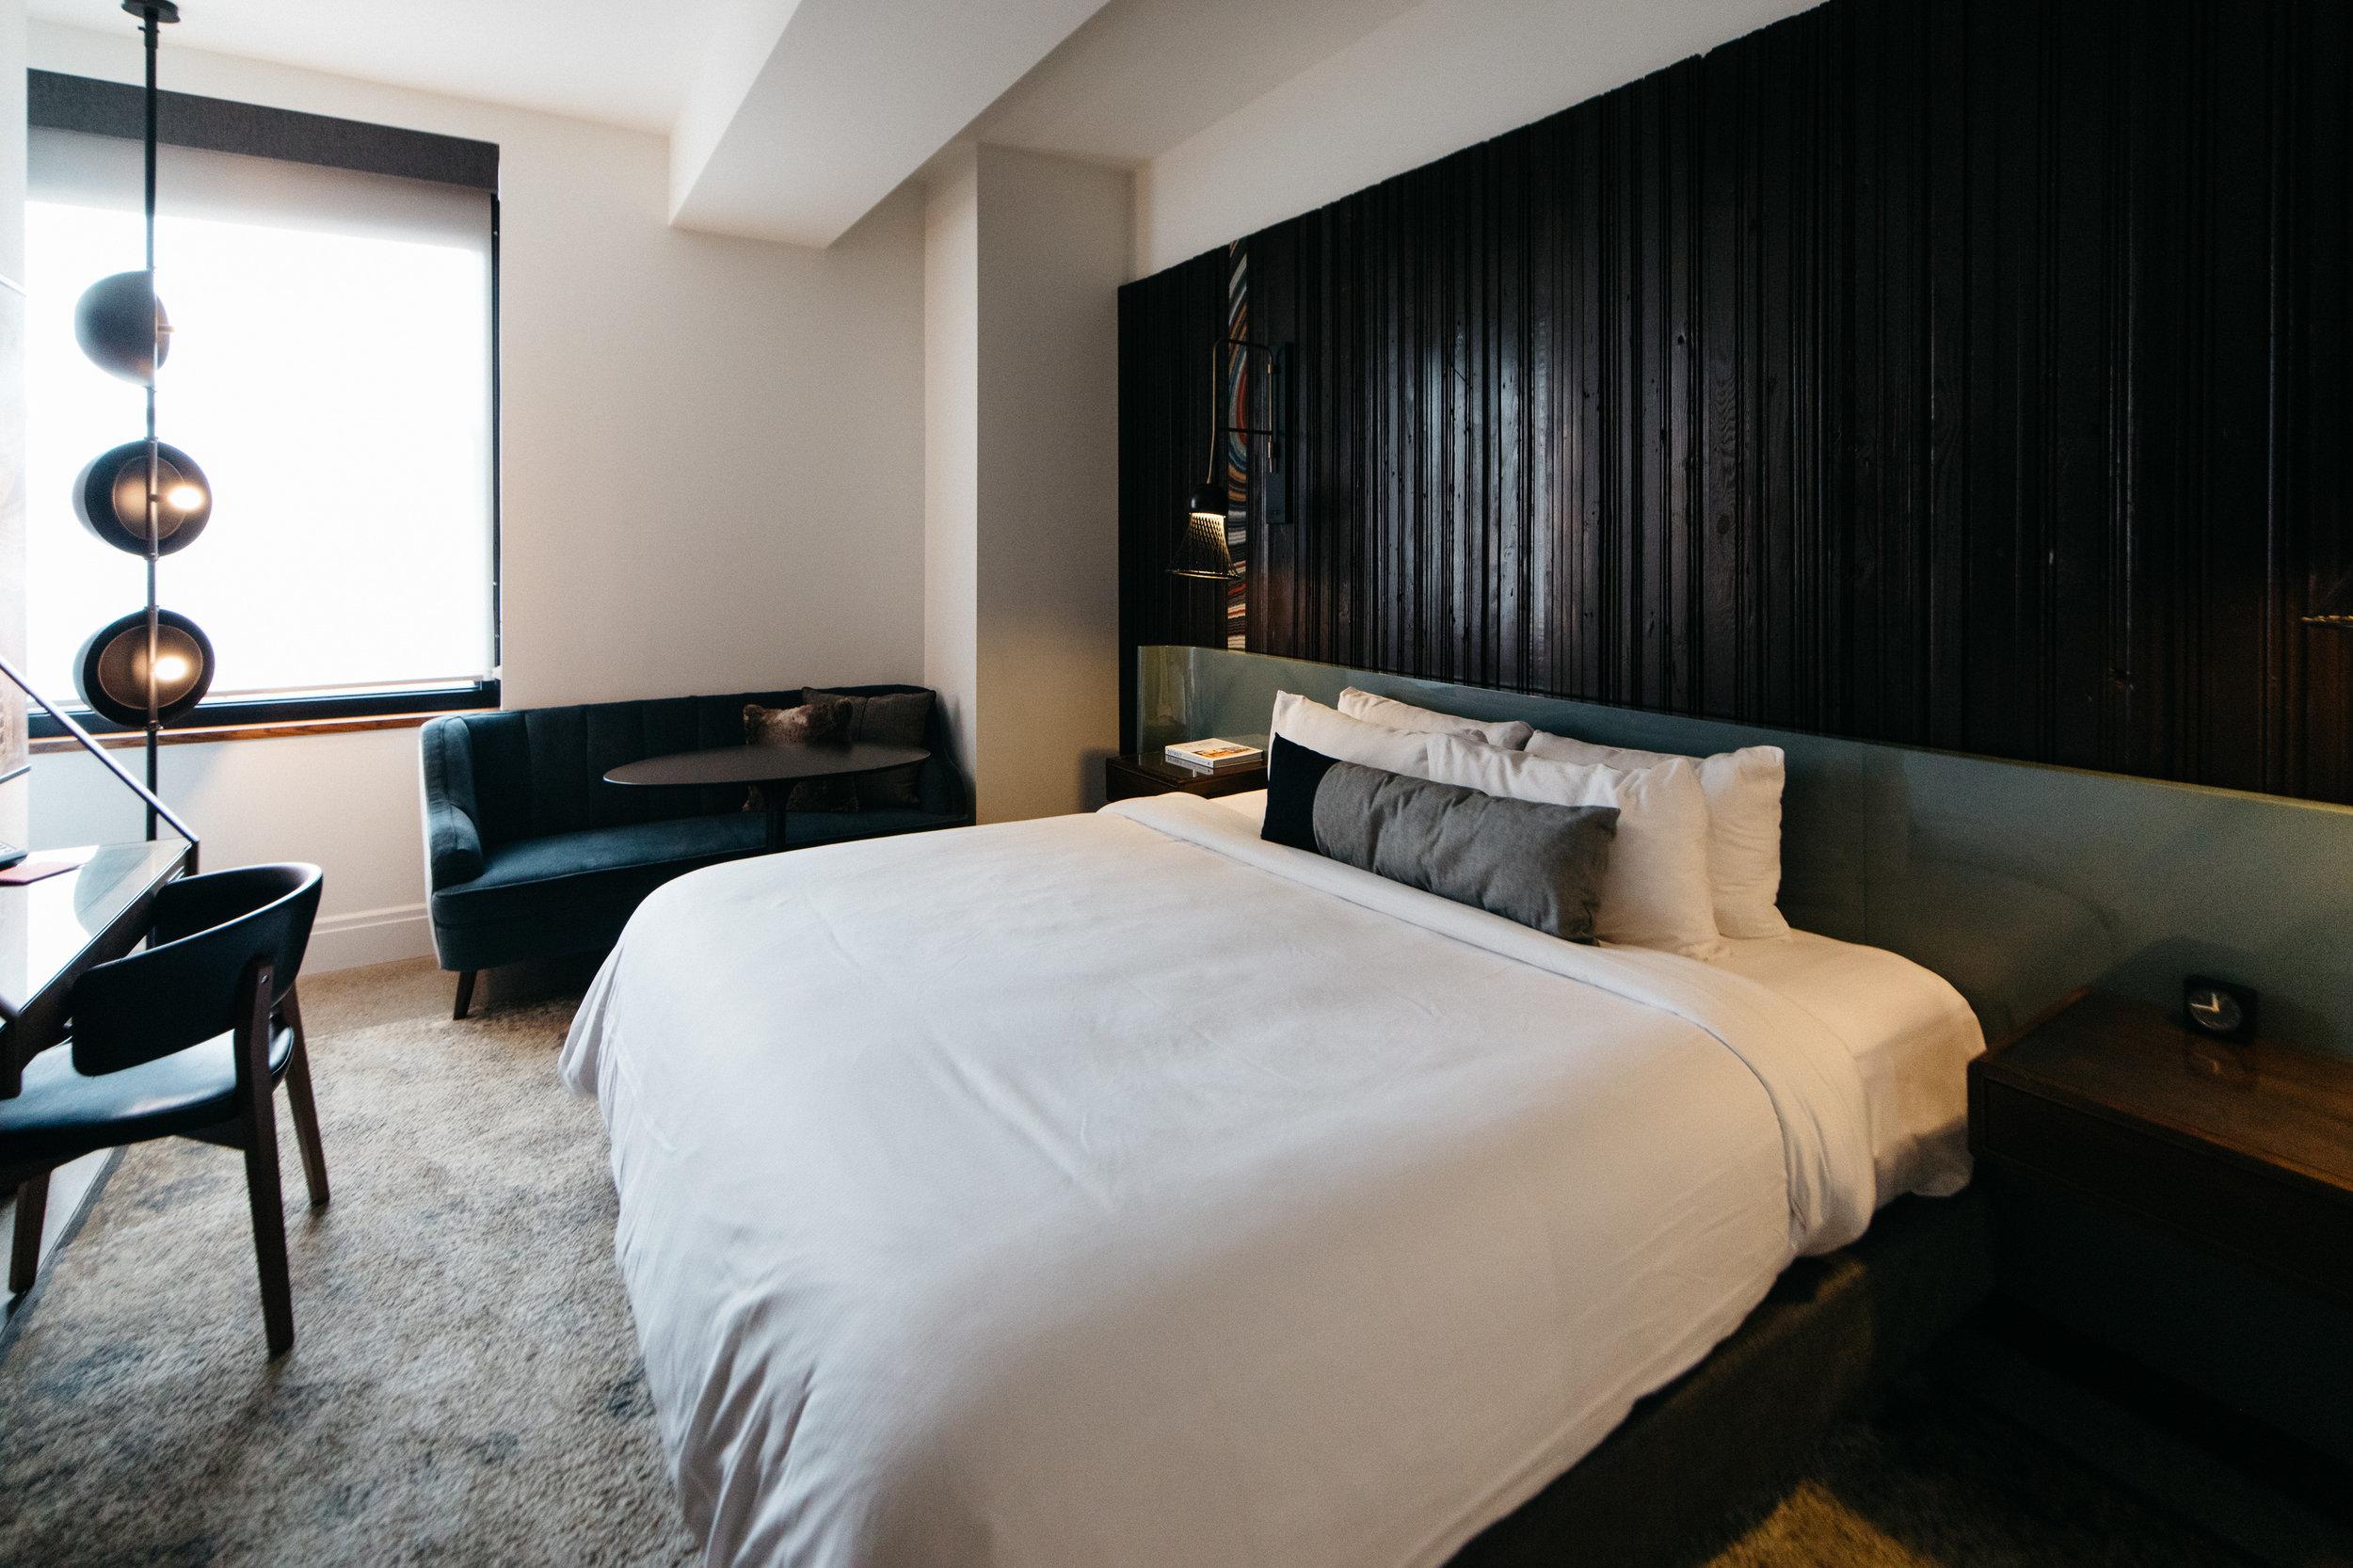 The Detroit Foundation Hotel